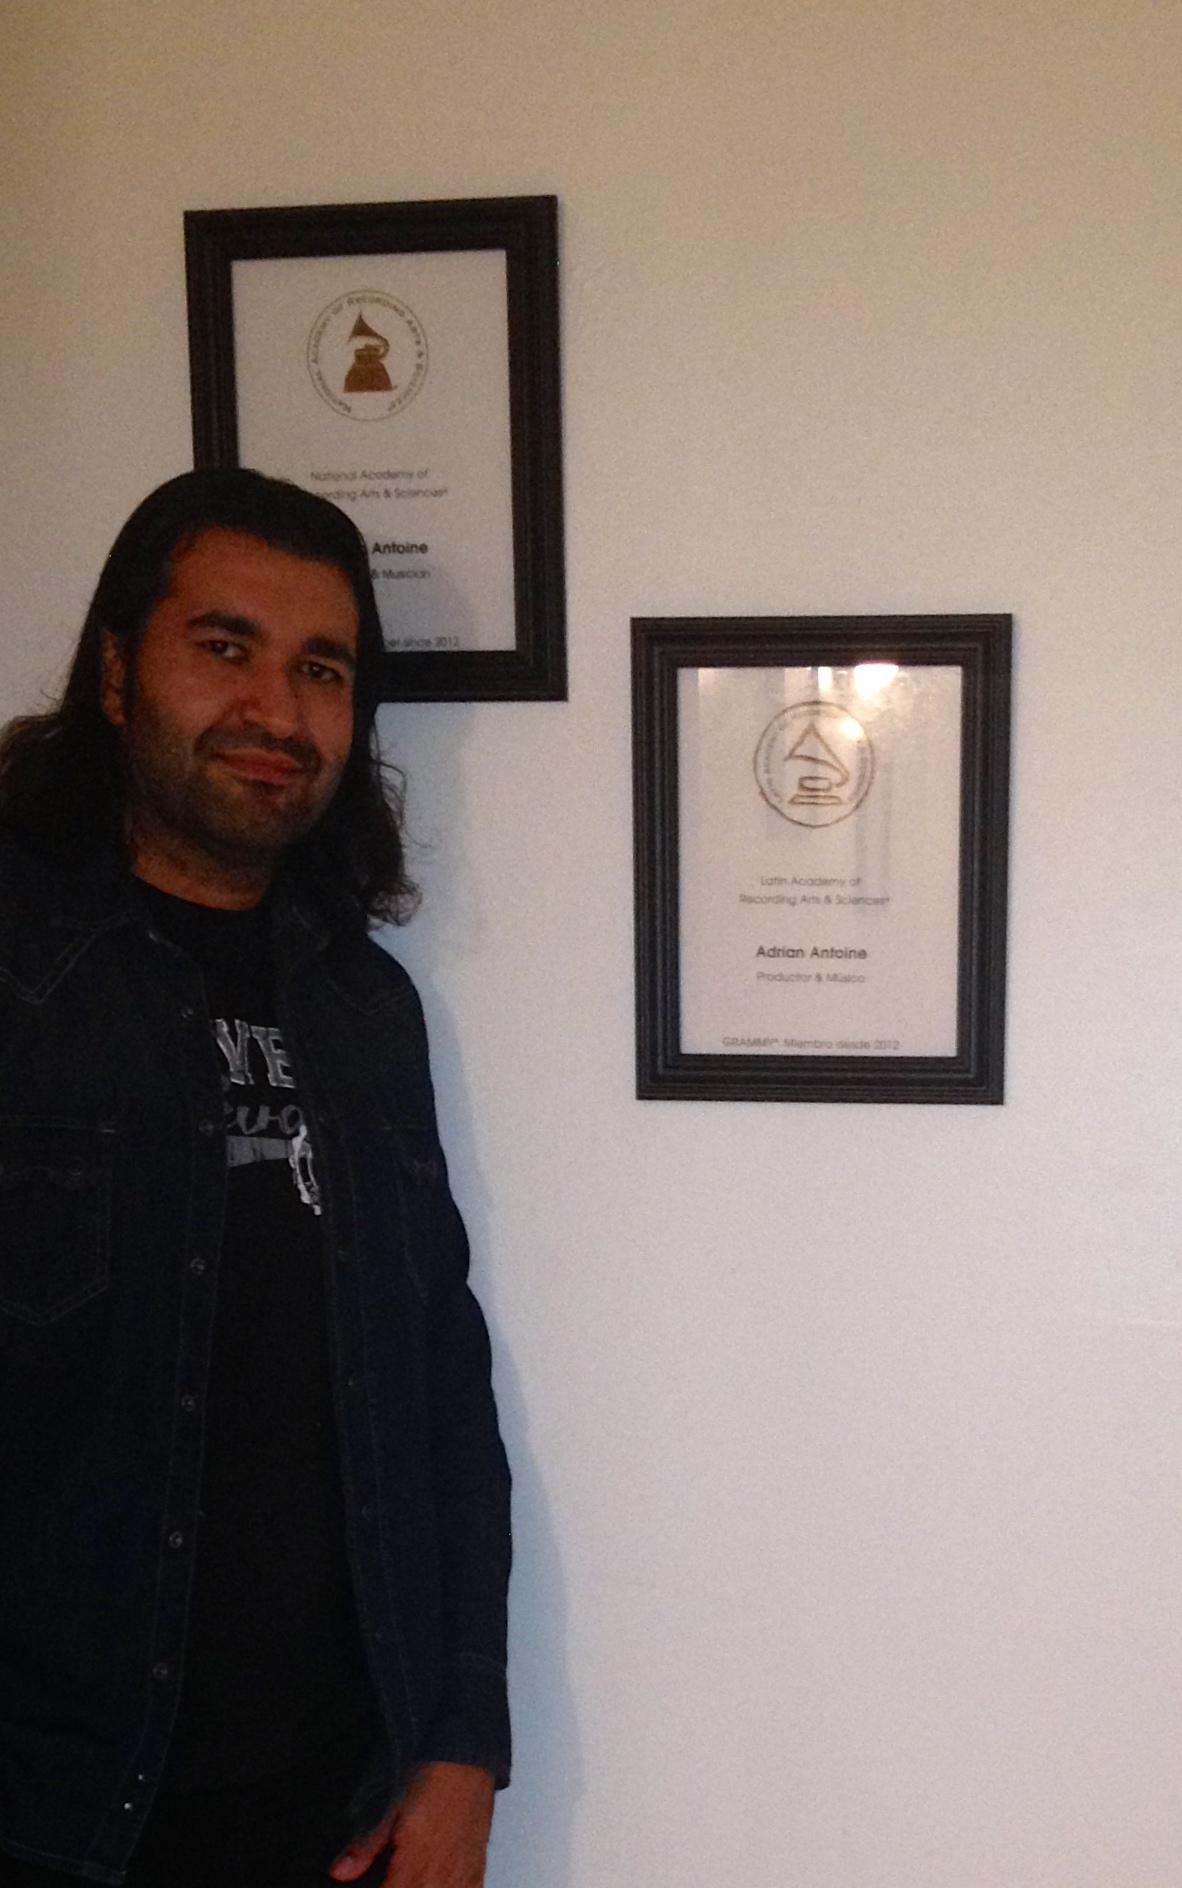 Proud Grammys Member